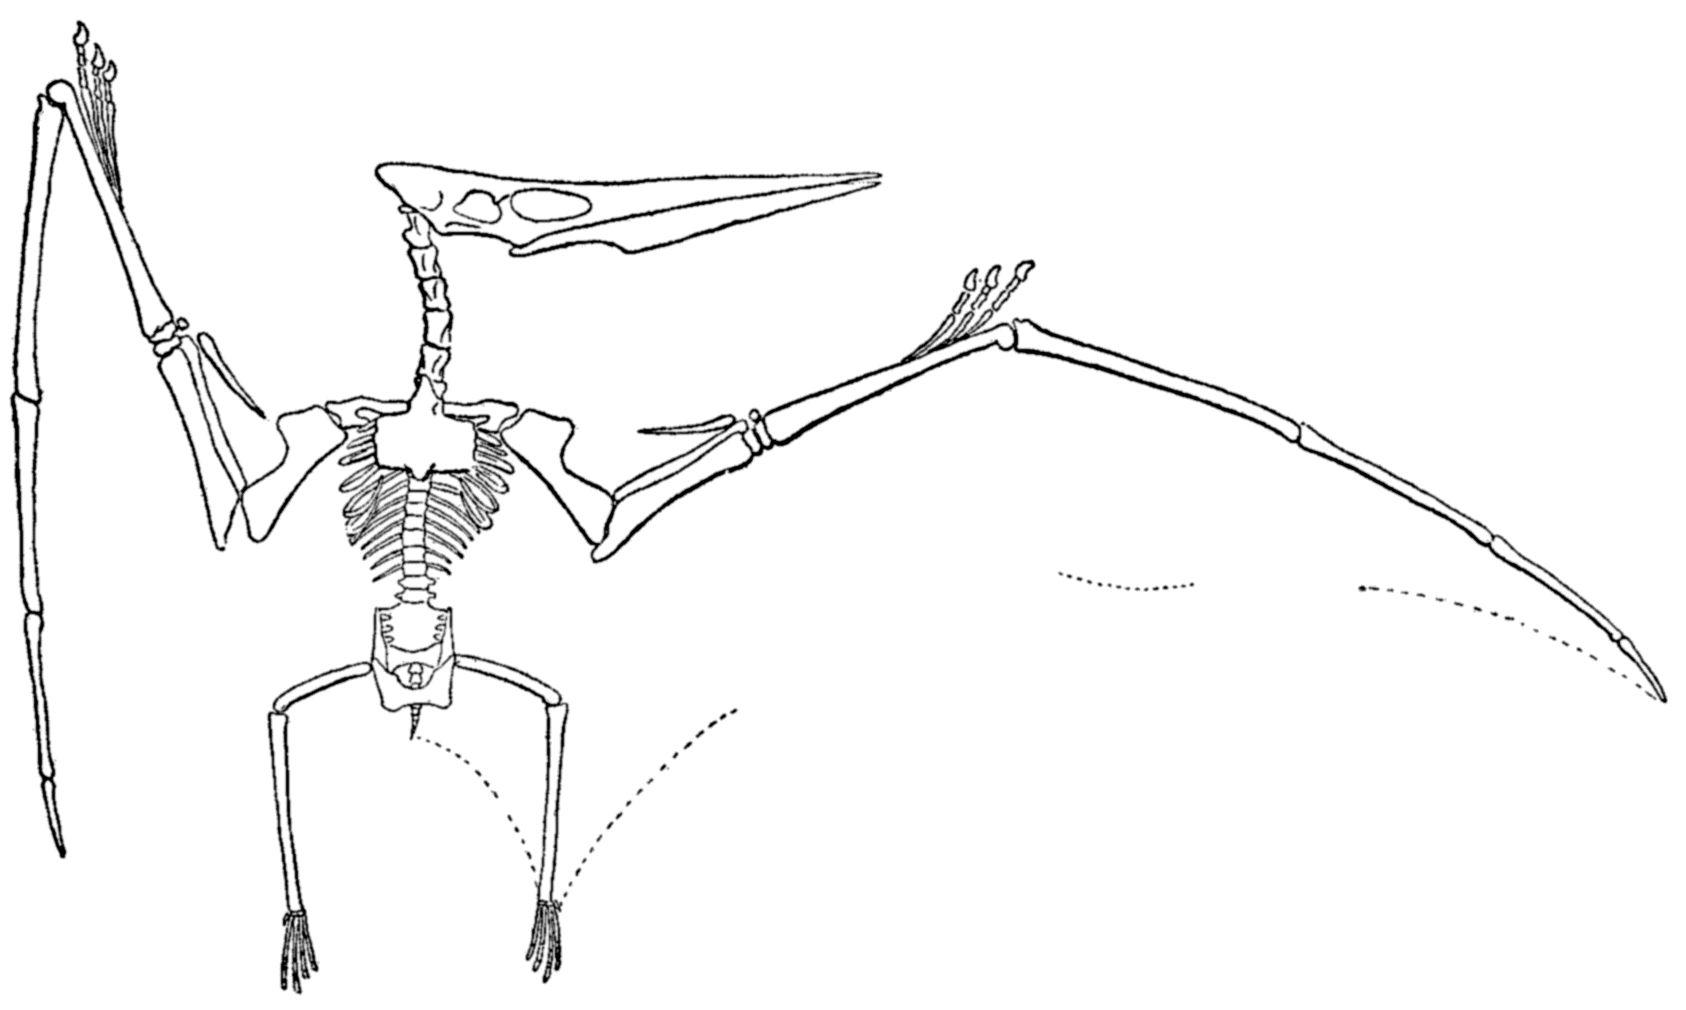 Pteranodon Wikipedia Skeleton Drawings Prehistoric Creatures Dinosaur Activities